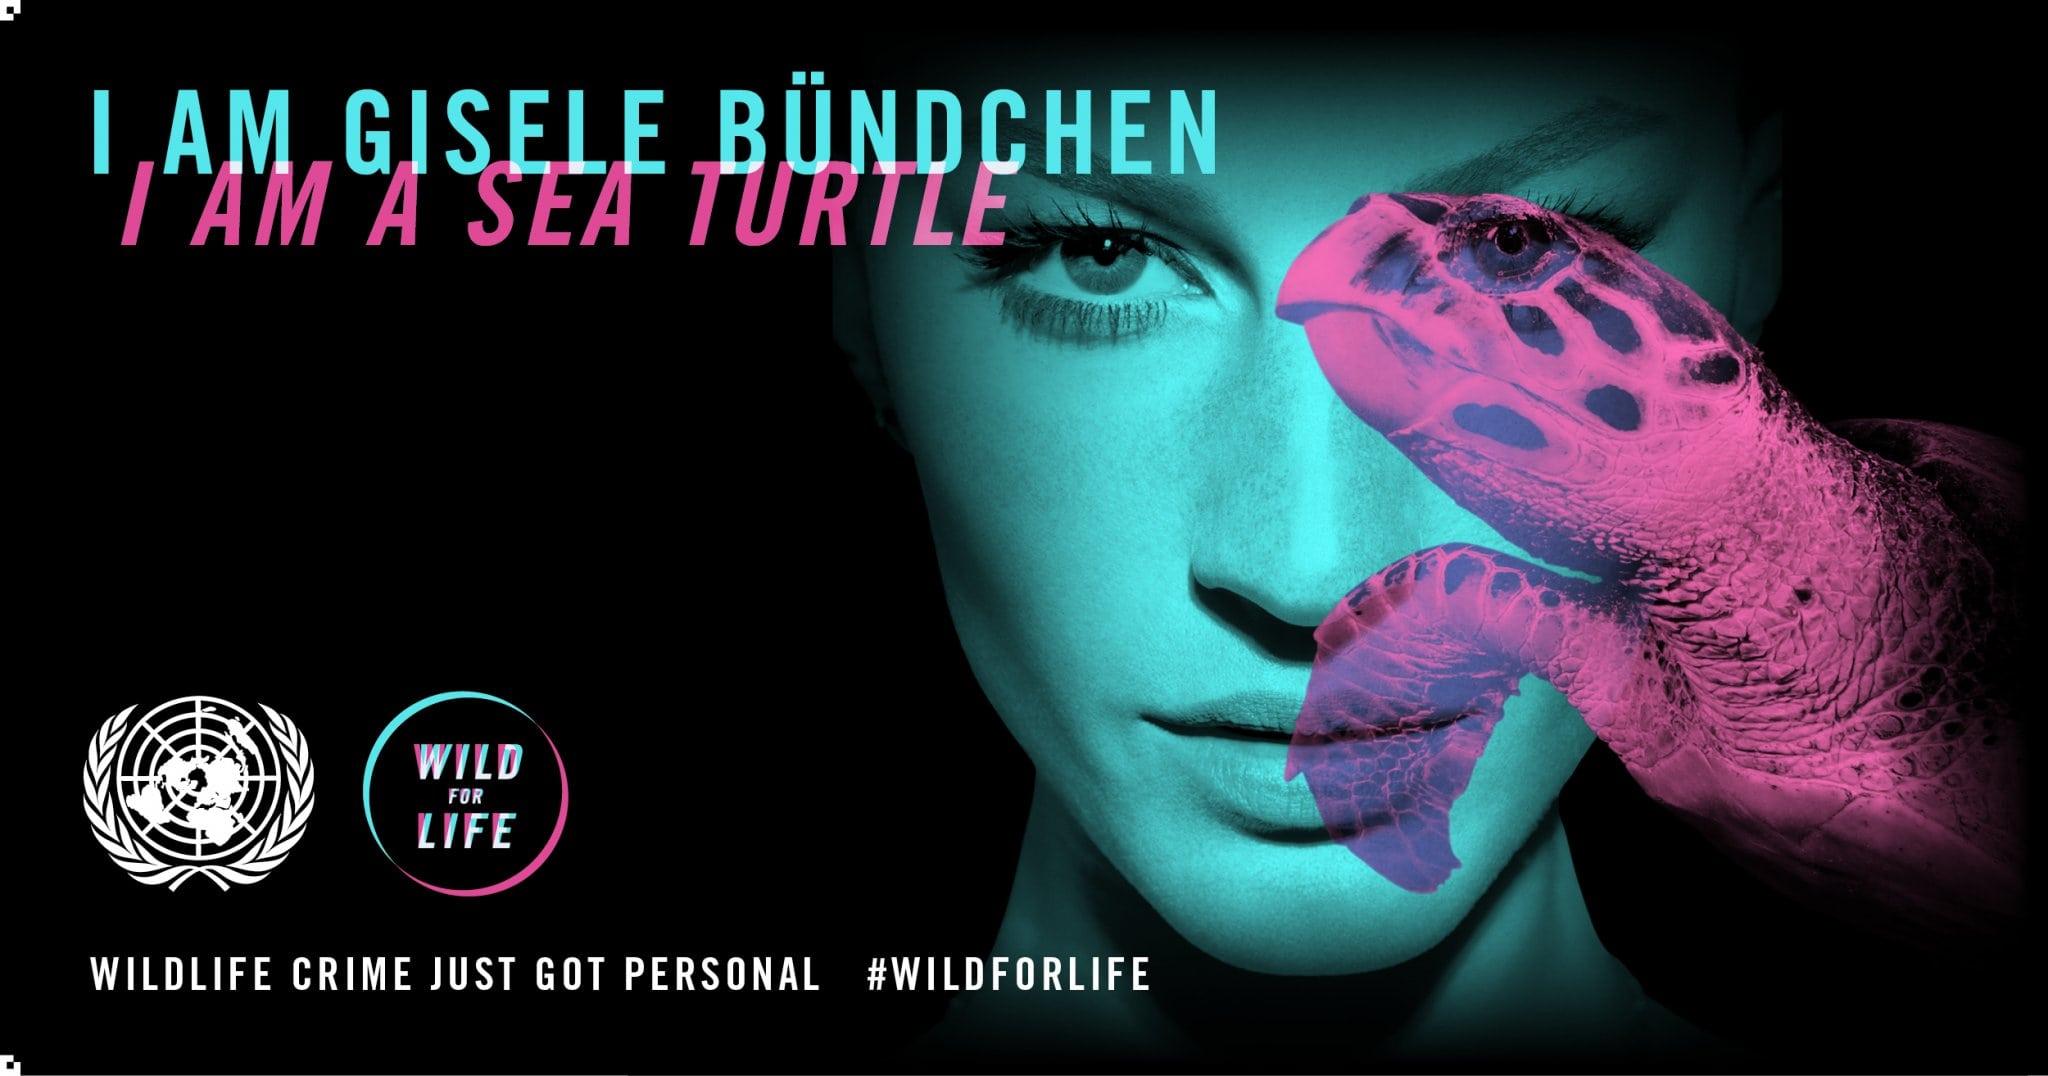 Image: Gisele Bundchen and a sea turtle.